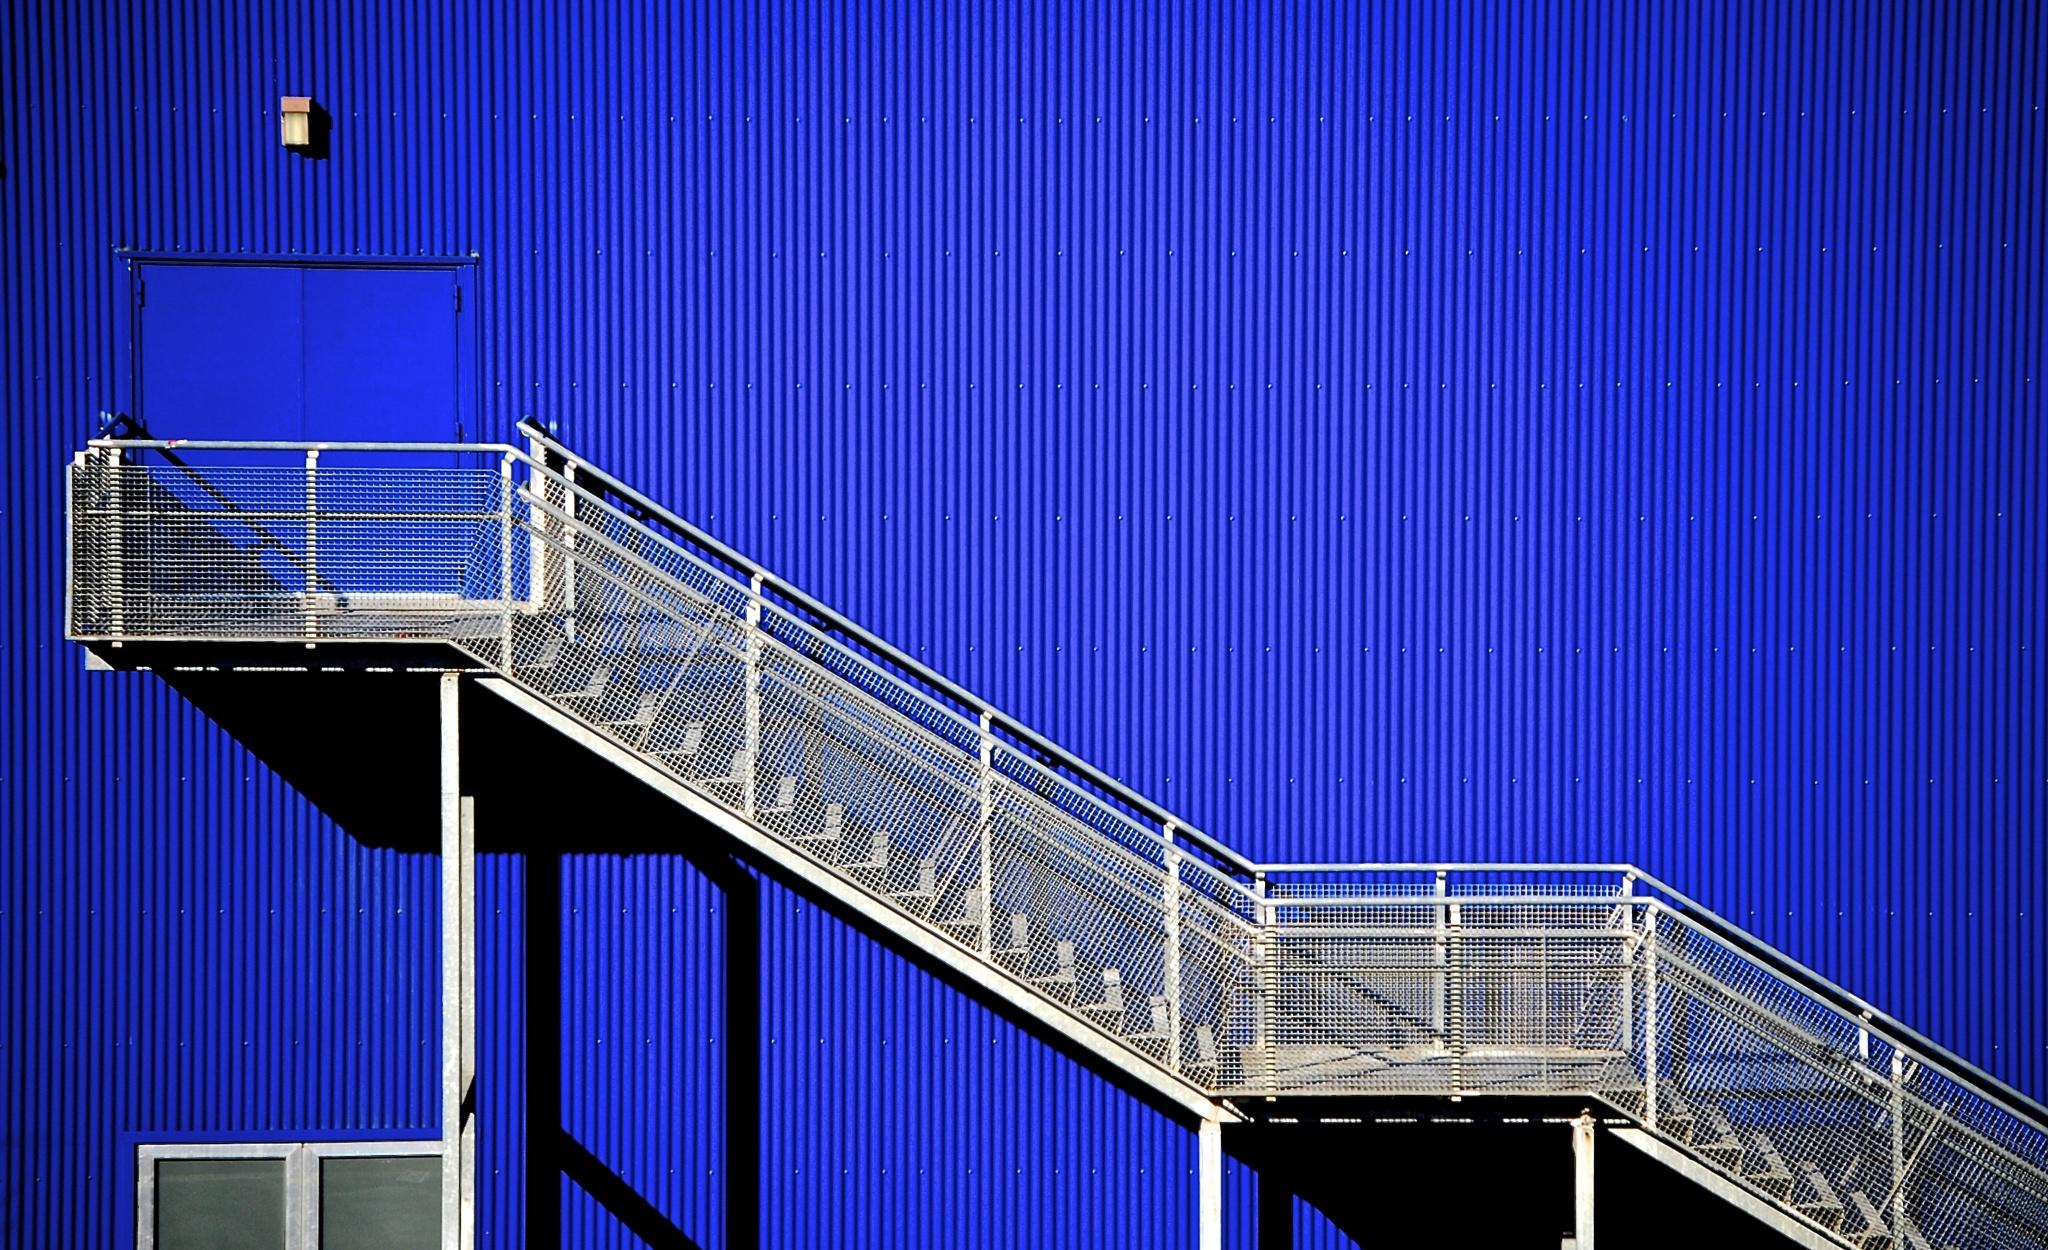 Stairs & blue by DanyParodi